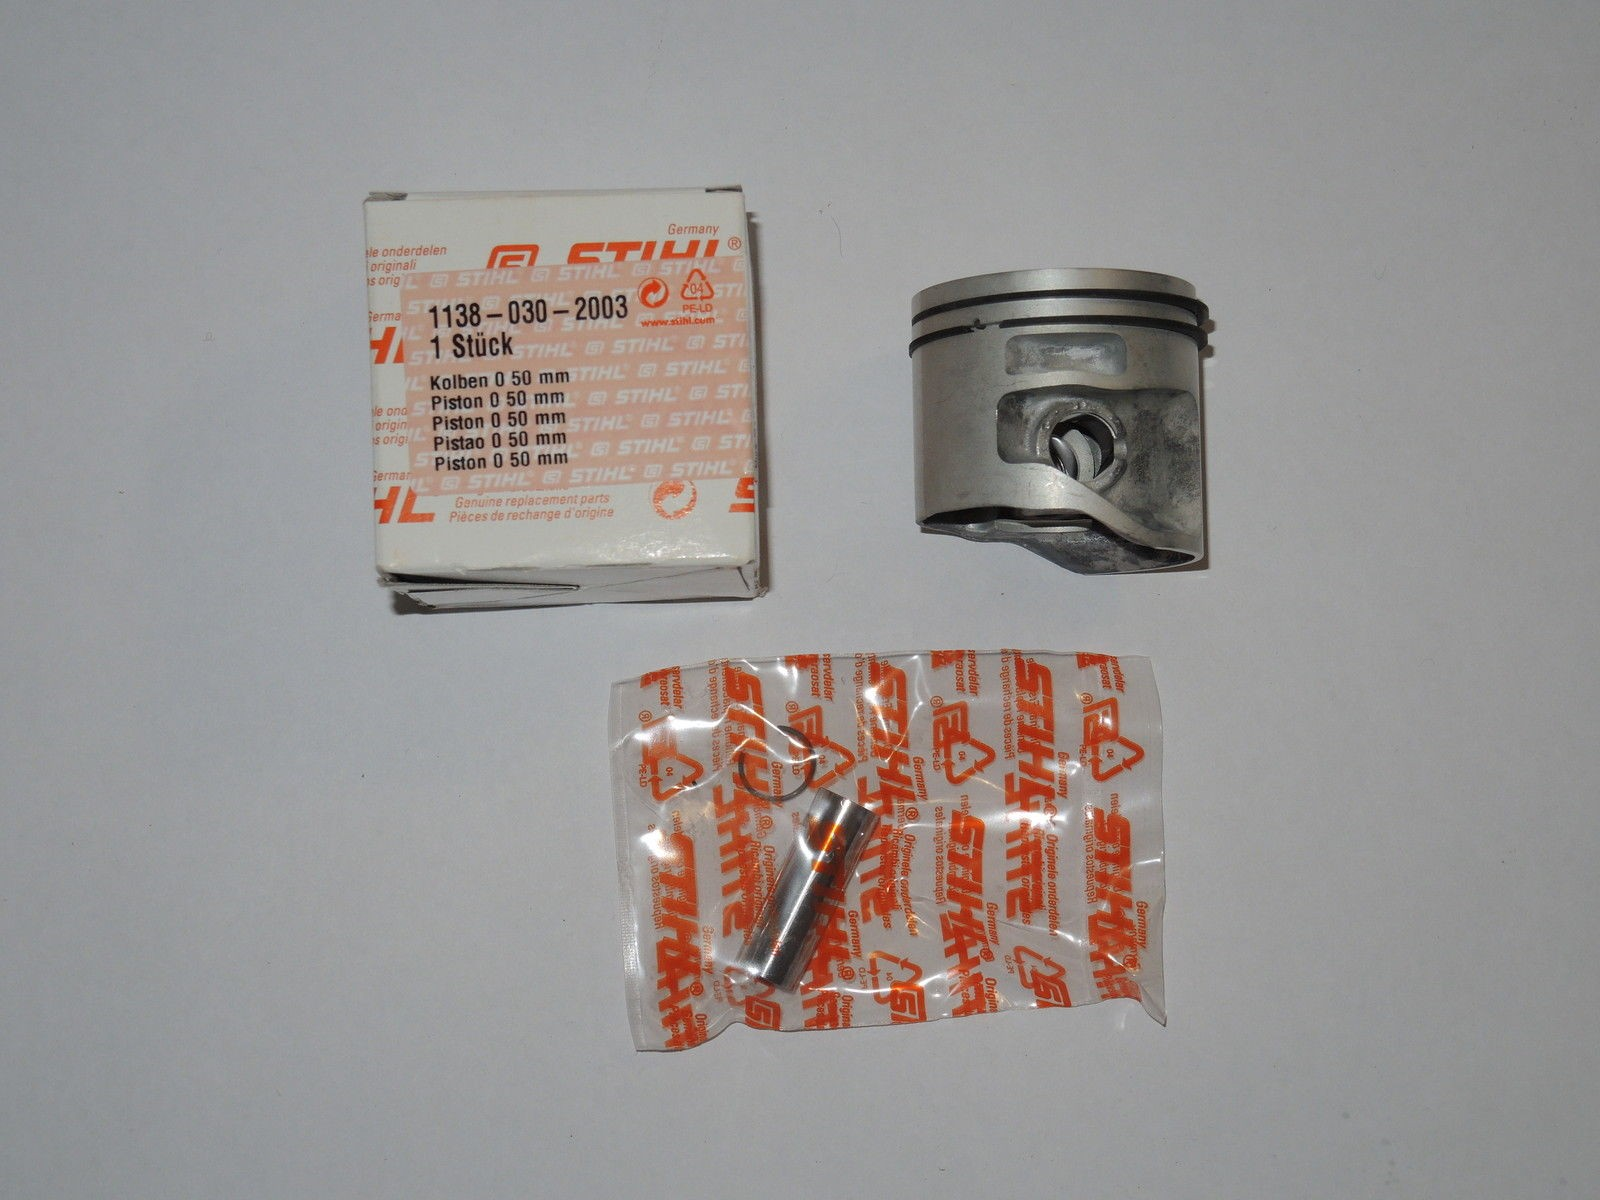 - Kolben Piston Kit for STIHL MS441 MS 441 C #11380302003 50mm